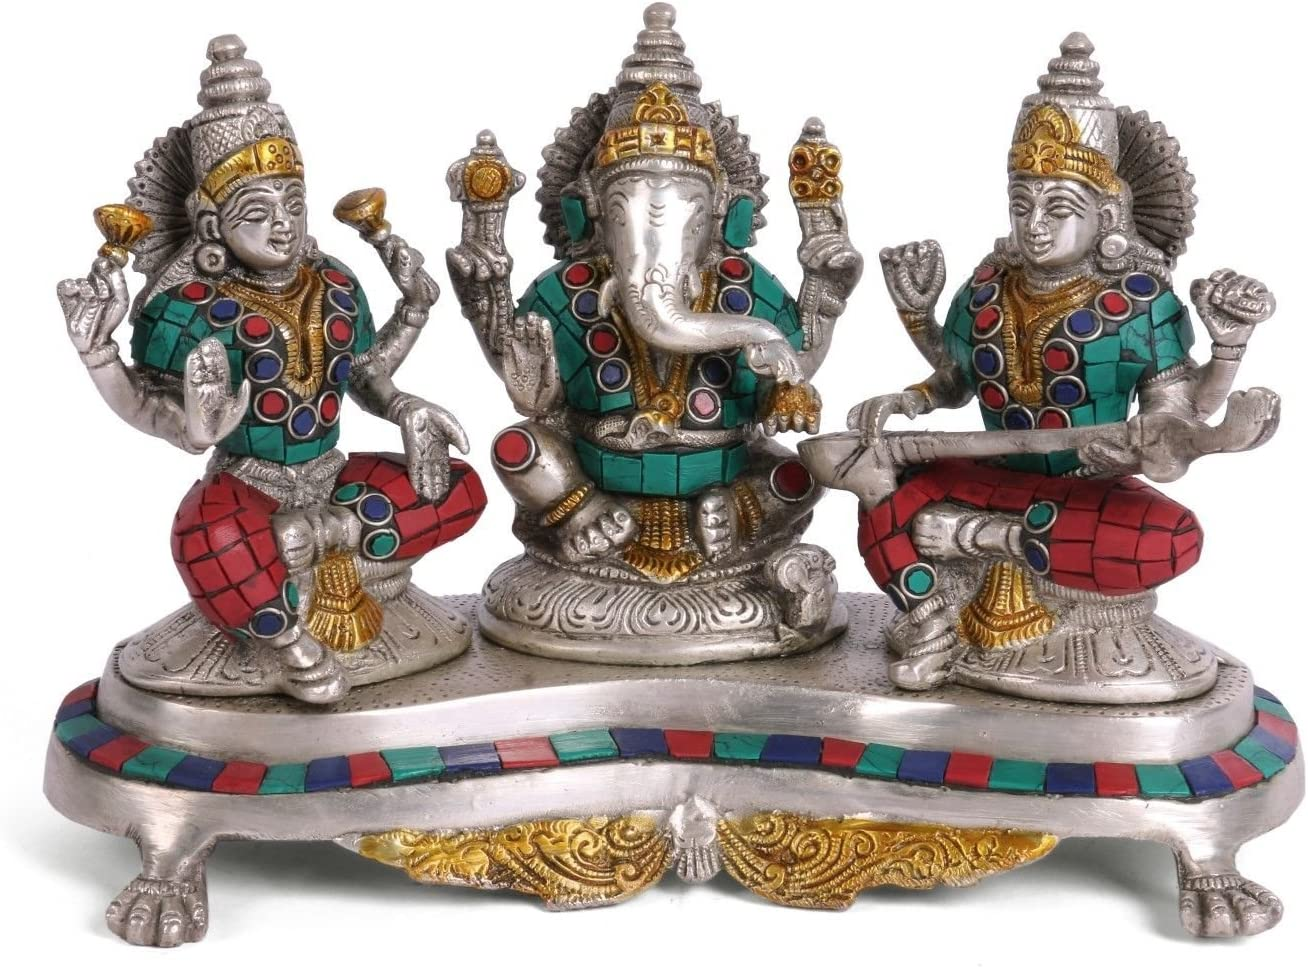 Lakshmi Ganesh Saraswati Statue Brass Figurine Ganpati God Ganesha Idol Home Decor Gift